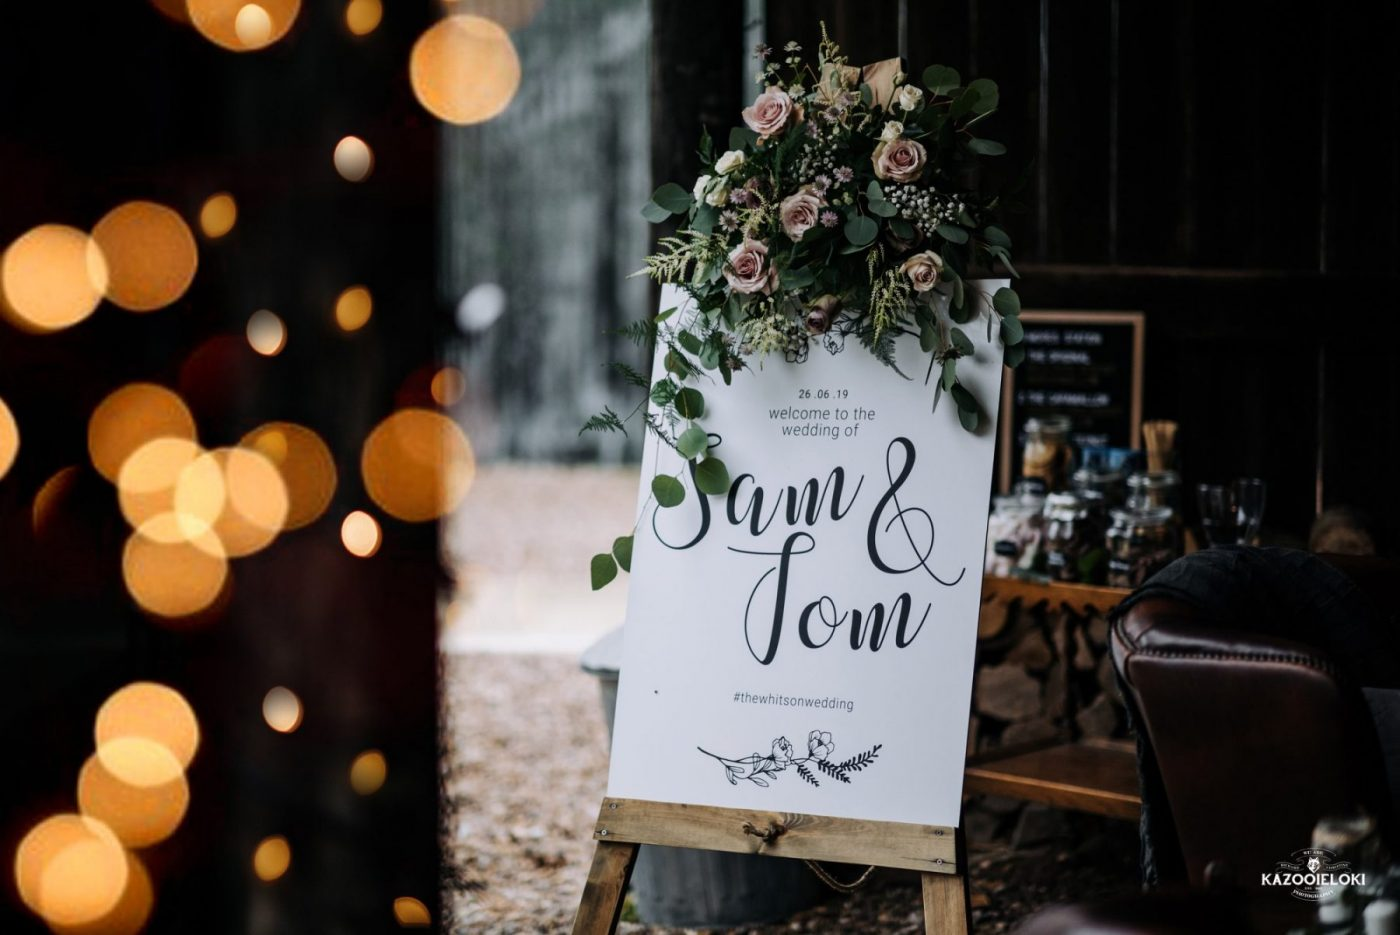 The Barns, East Yorkshire Wedding Venue